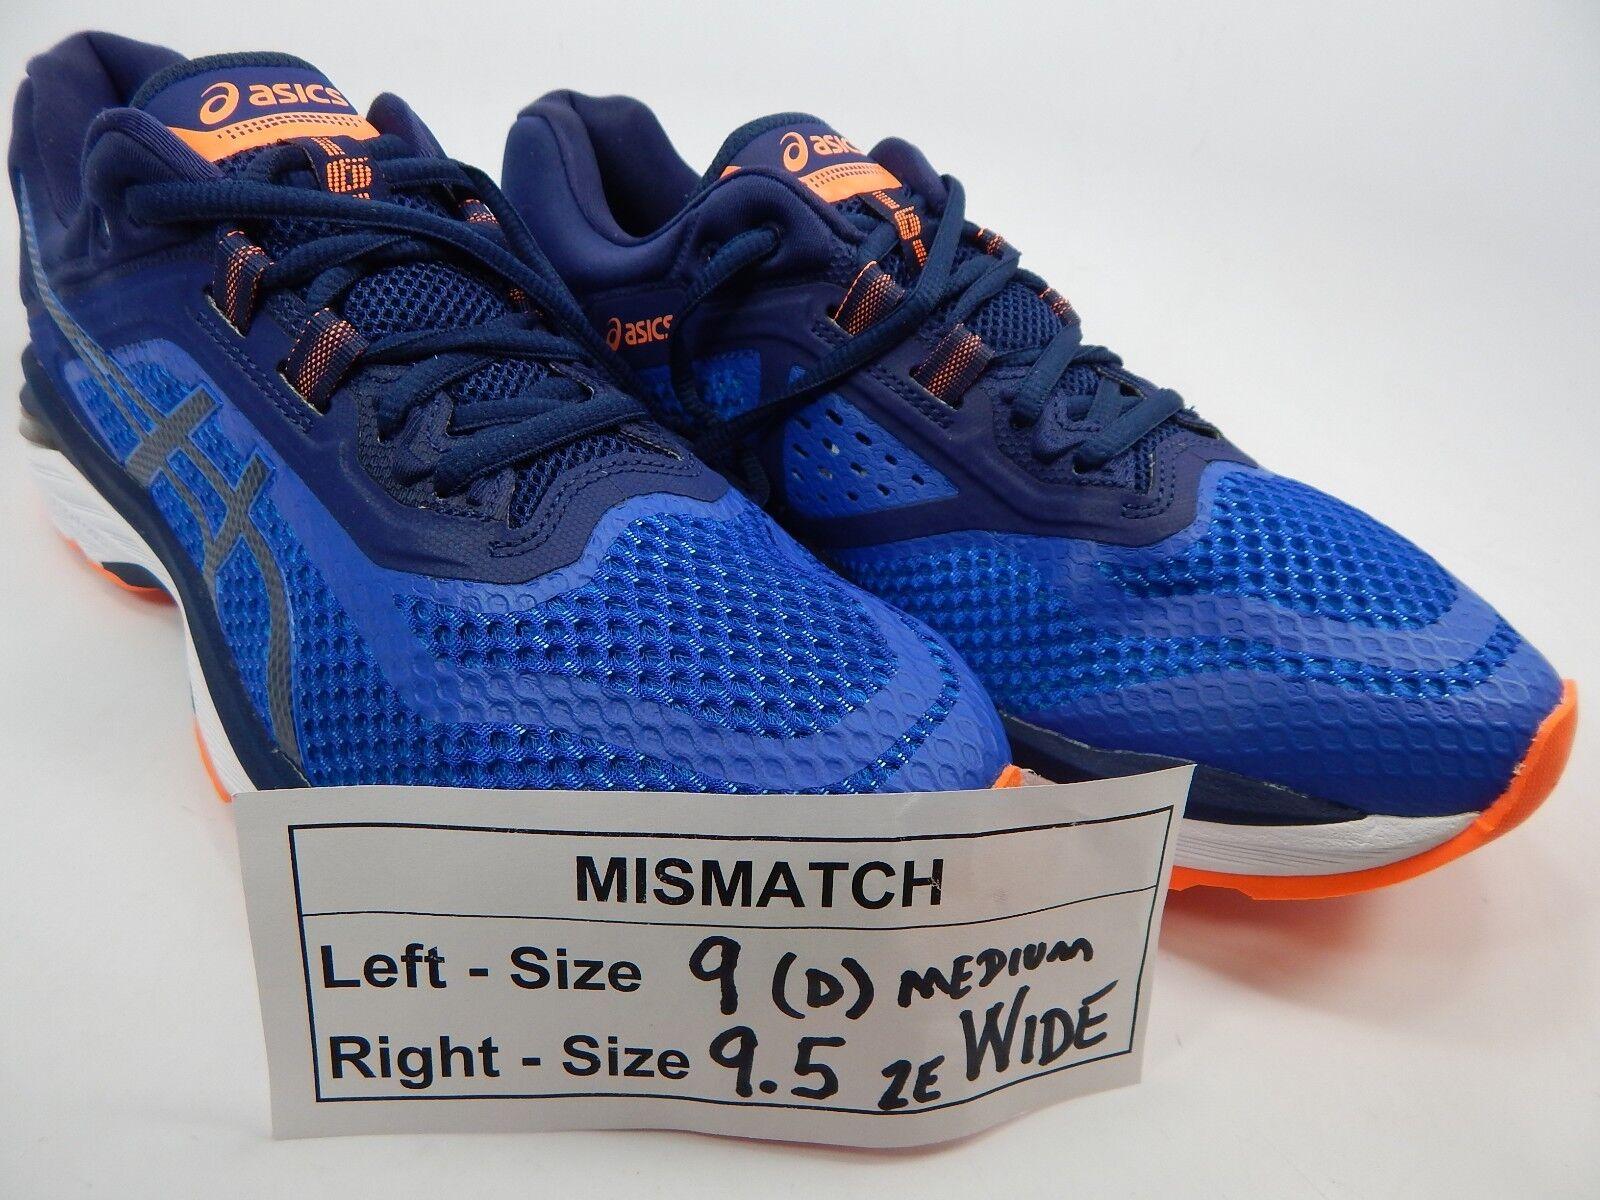 MISMATCH Asics GT 2018 v 6 Homme Chaussures